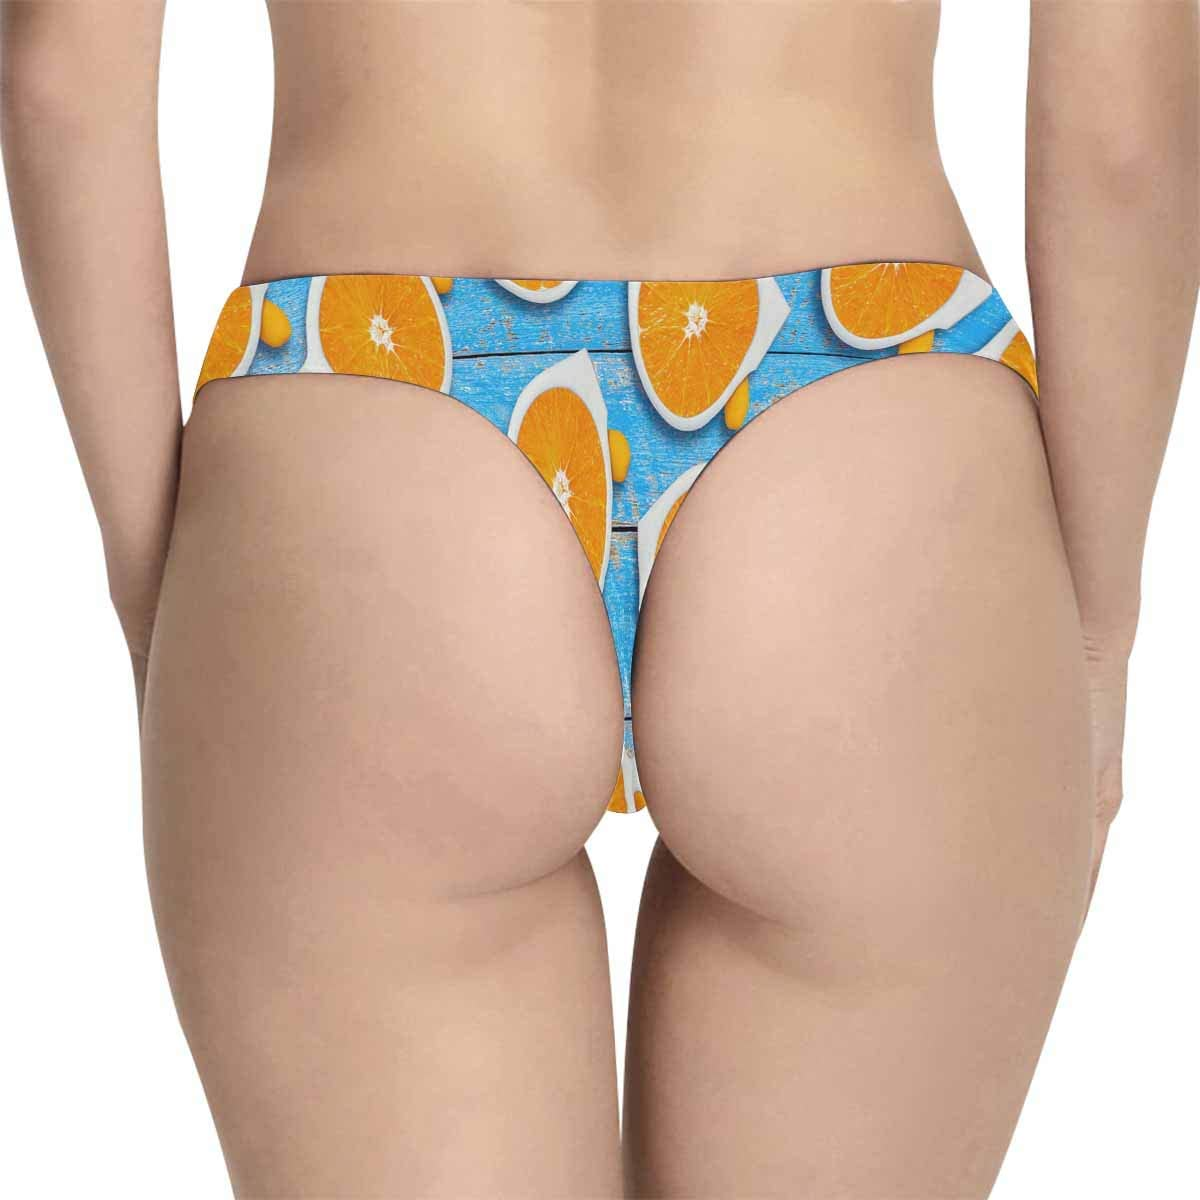 INTERESTPRINT Womens Thong Underwear Stretchy Panties Orange Sliced Sunglasses on Wood Background